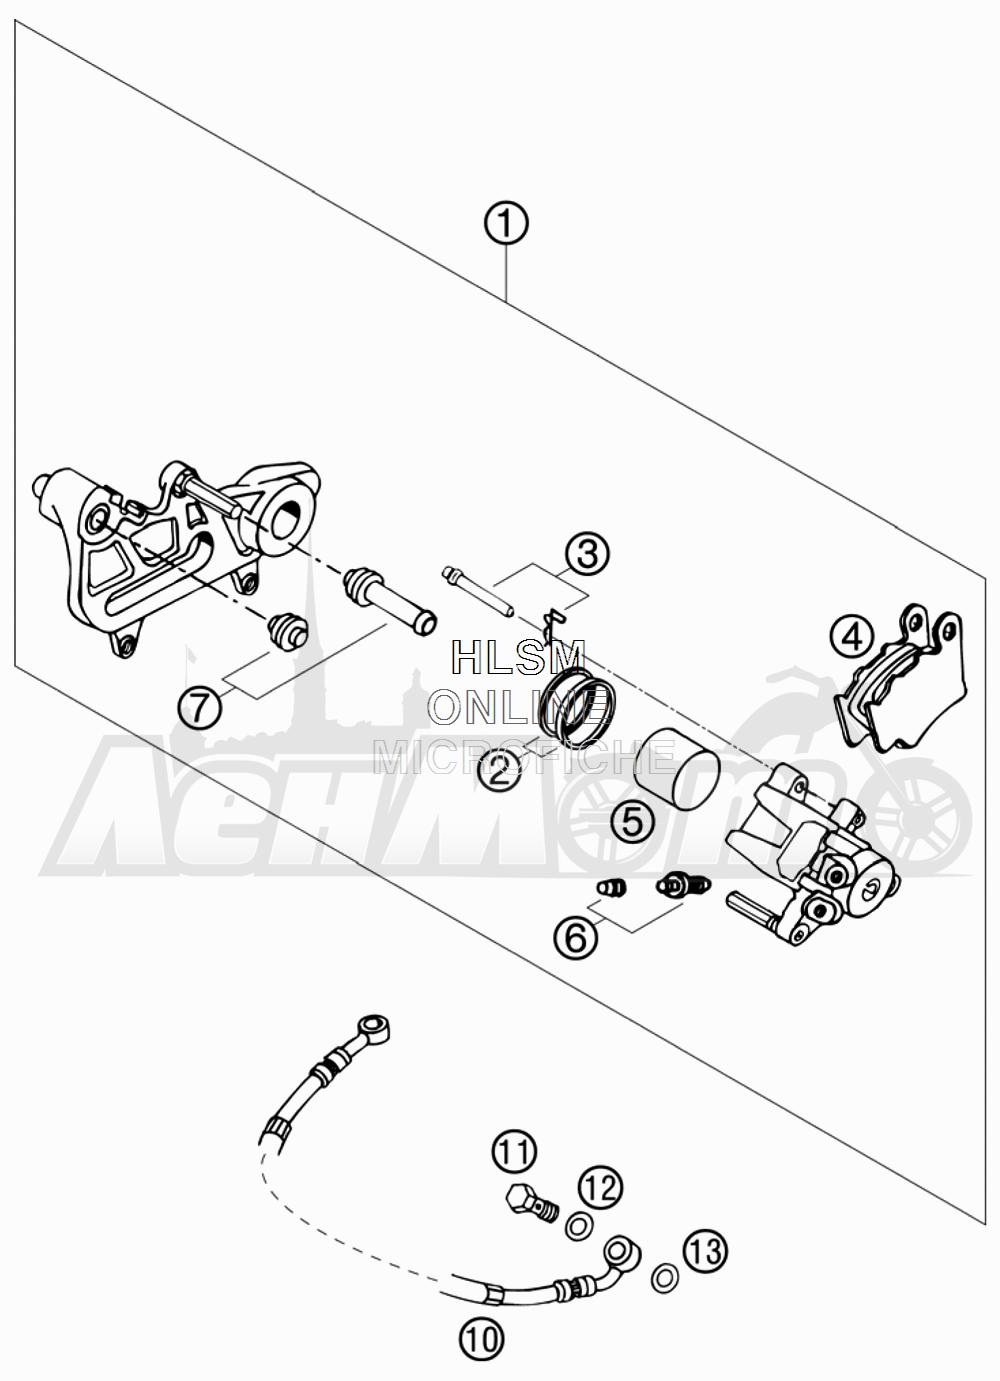 Ktm 640 Lc4 Wiring Diagram